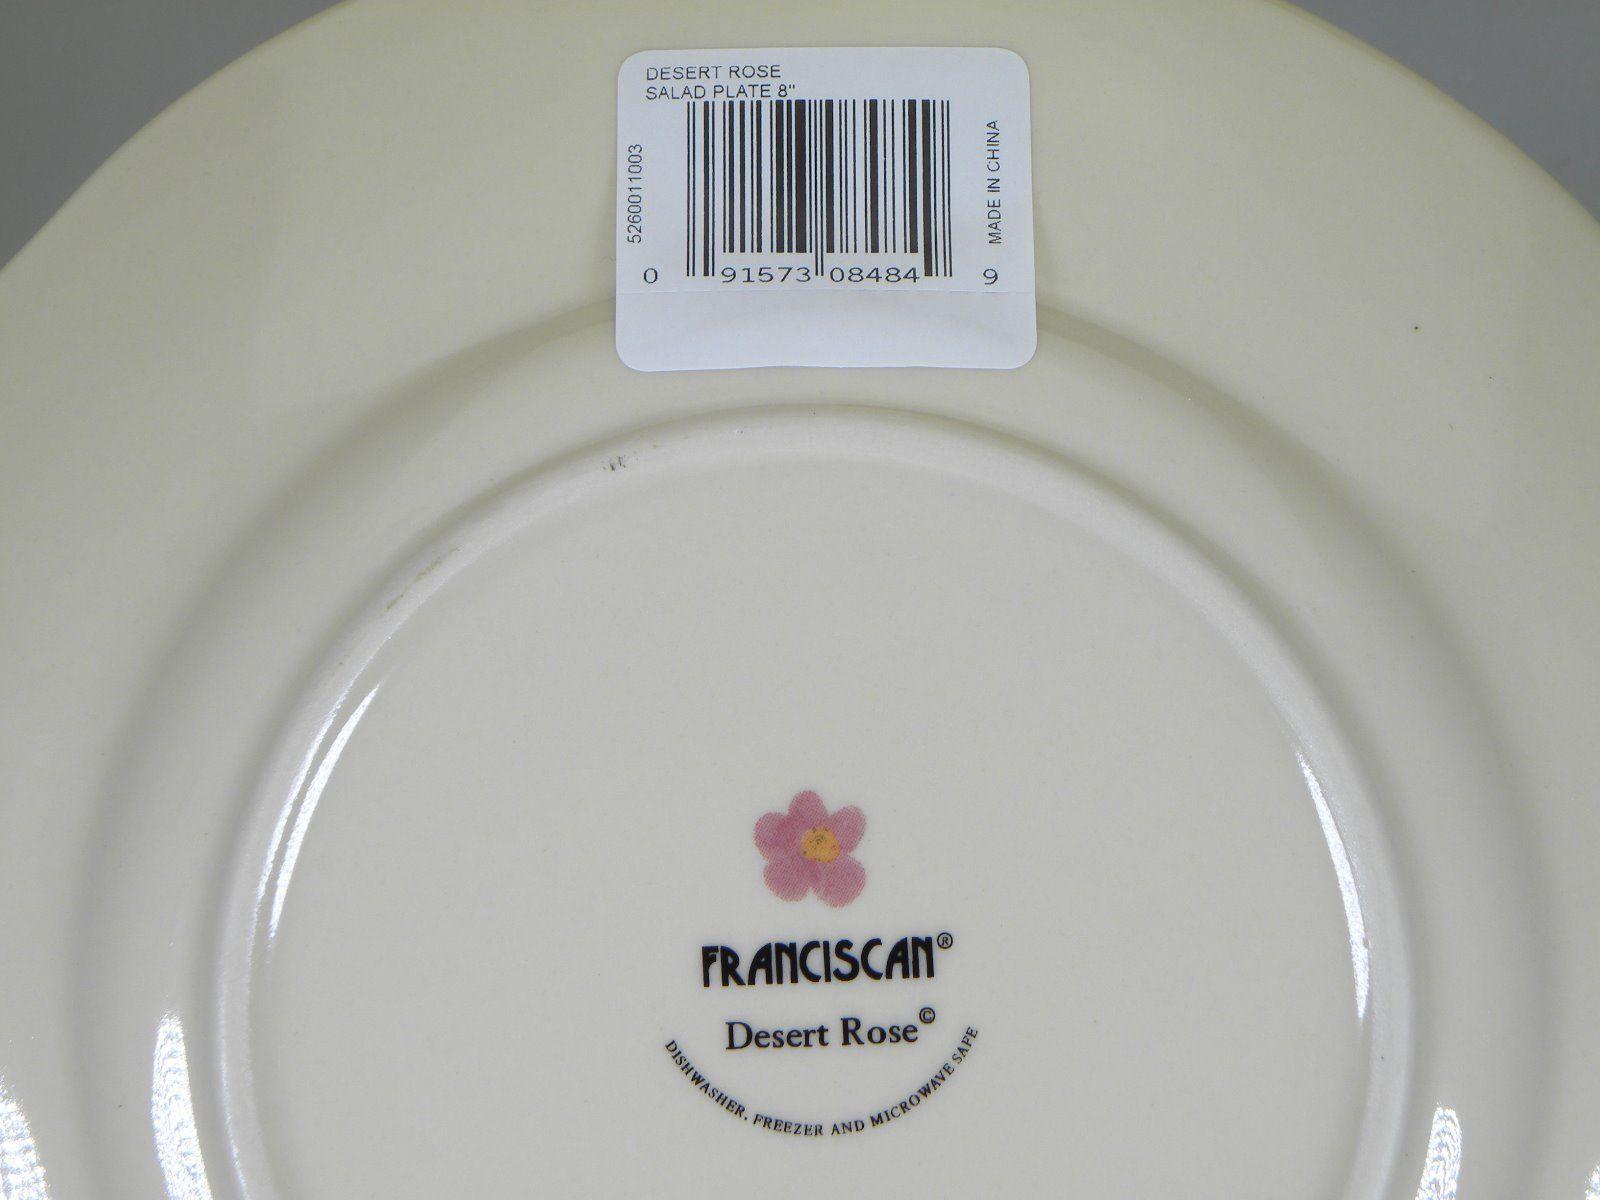 Franciscan Desert Rose Salad Plate BRAND NEW PRODUCTION